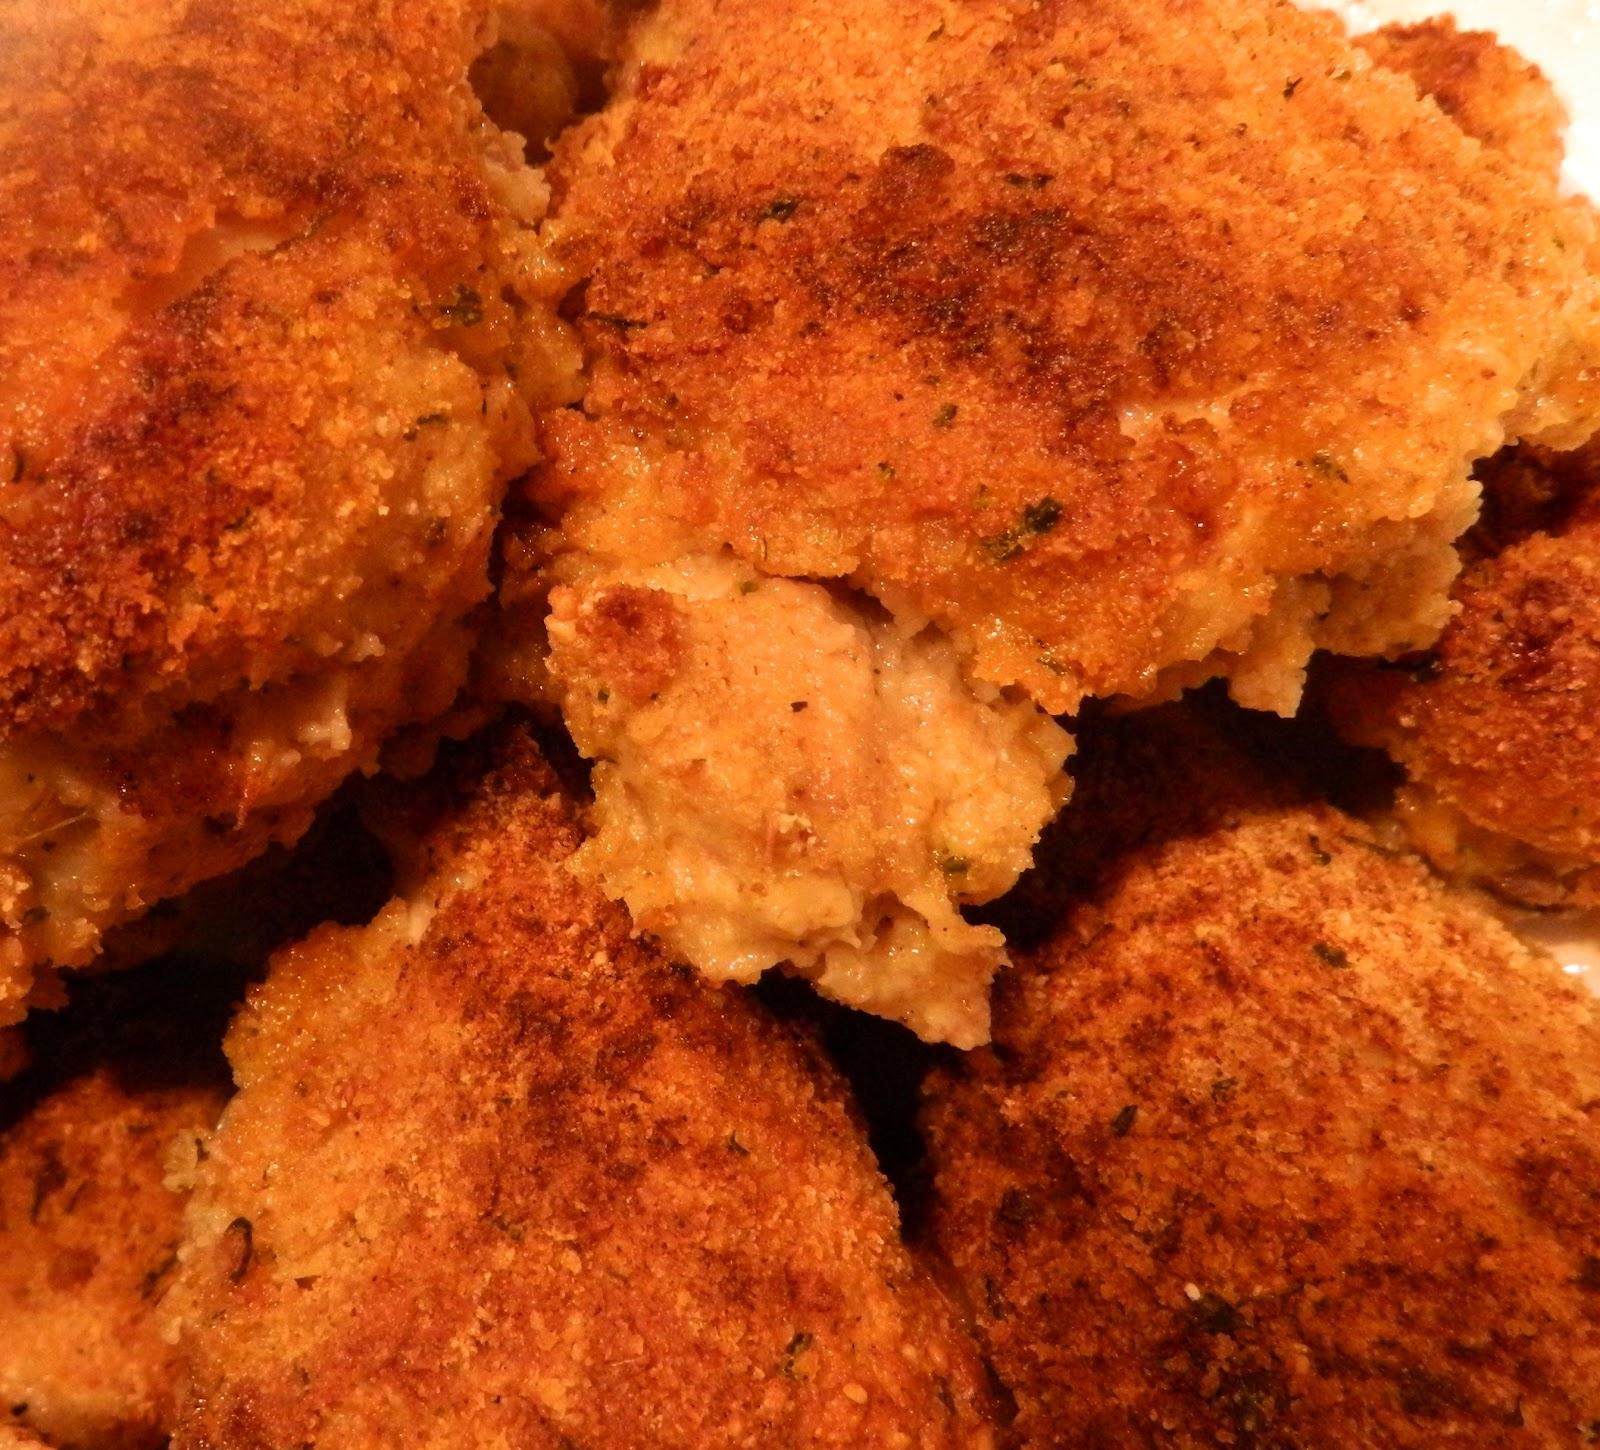 Murph's Kitchen: Super Crispy Oven Fried Chicken